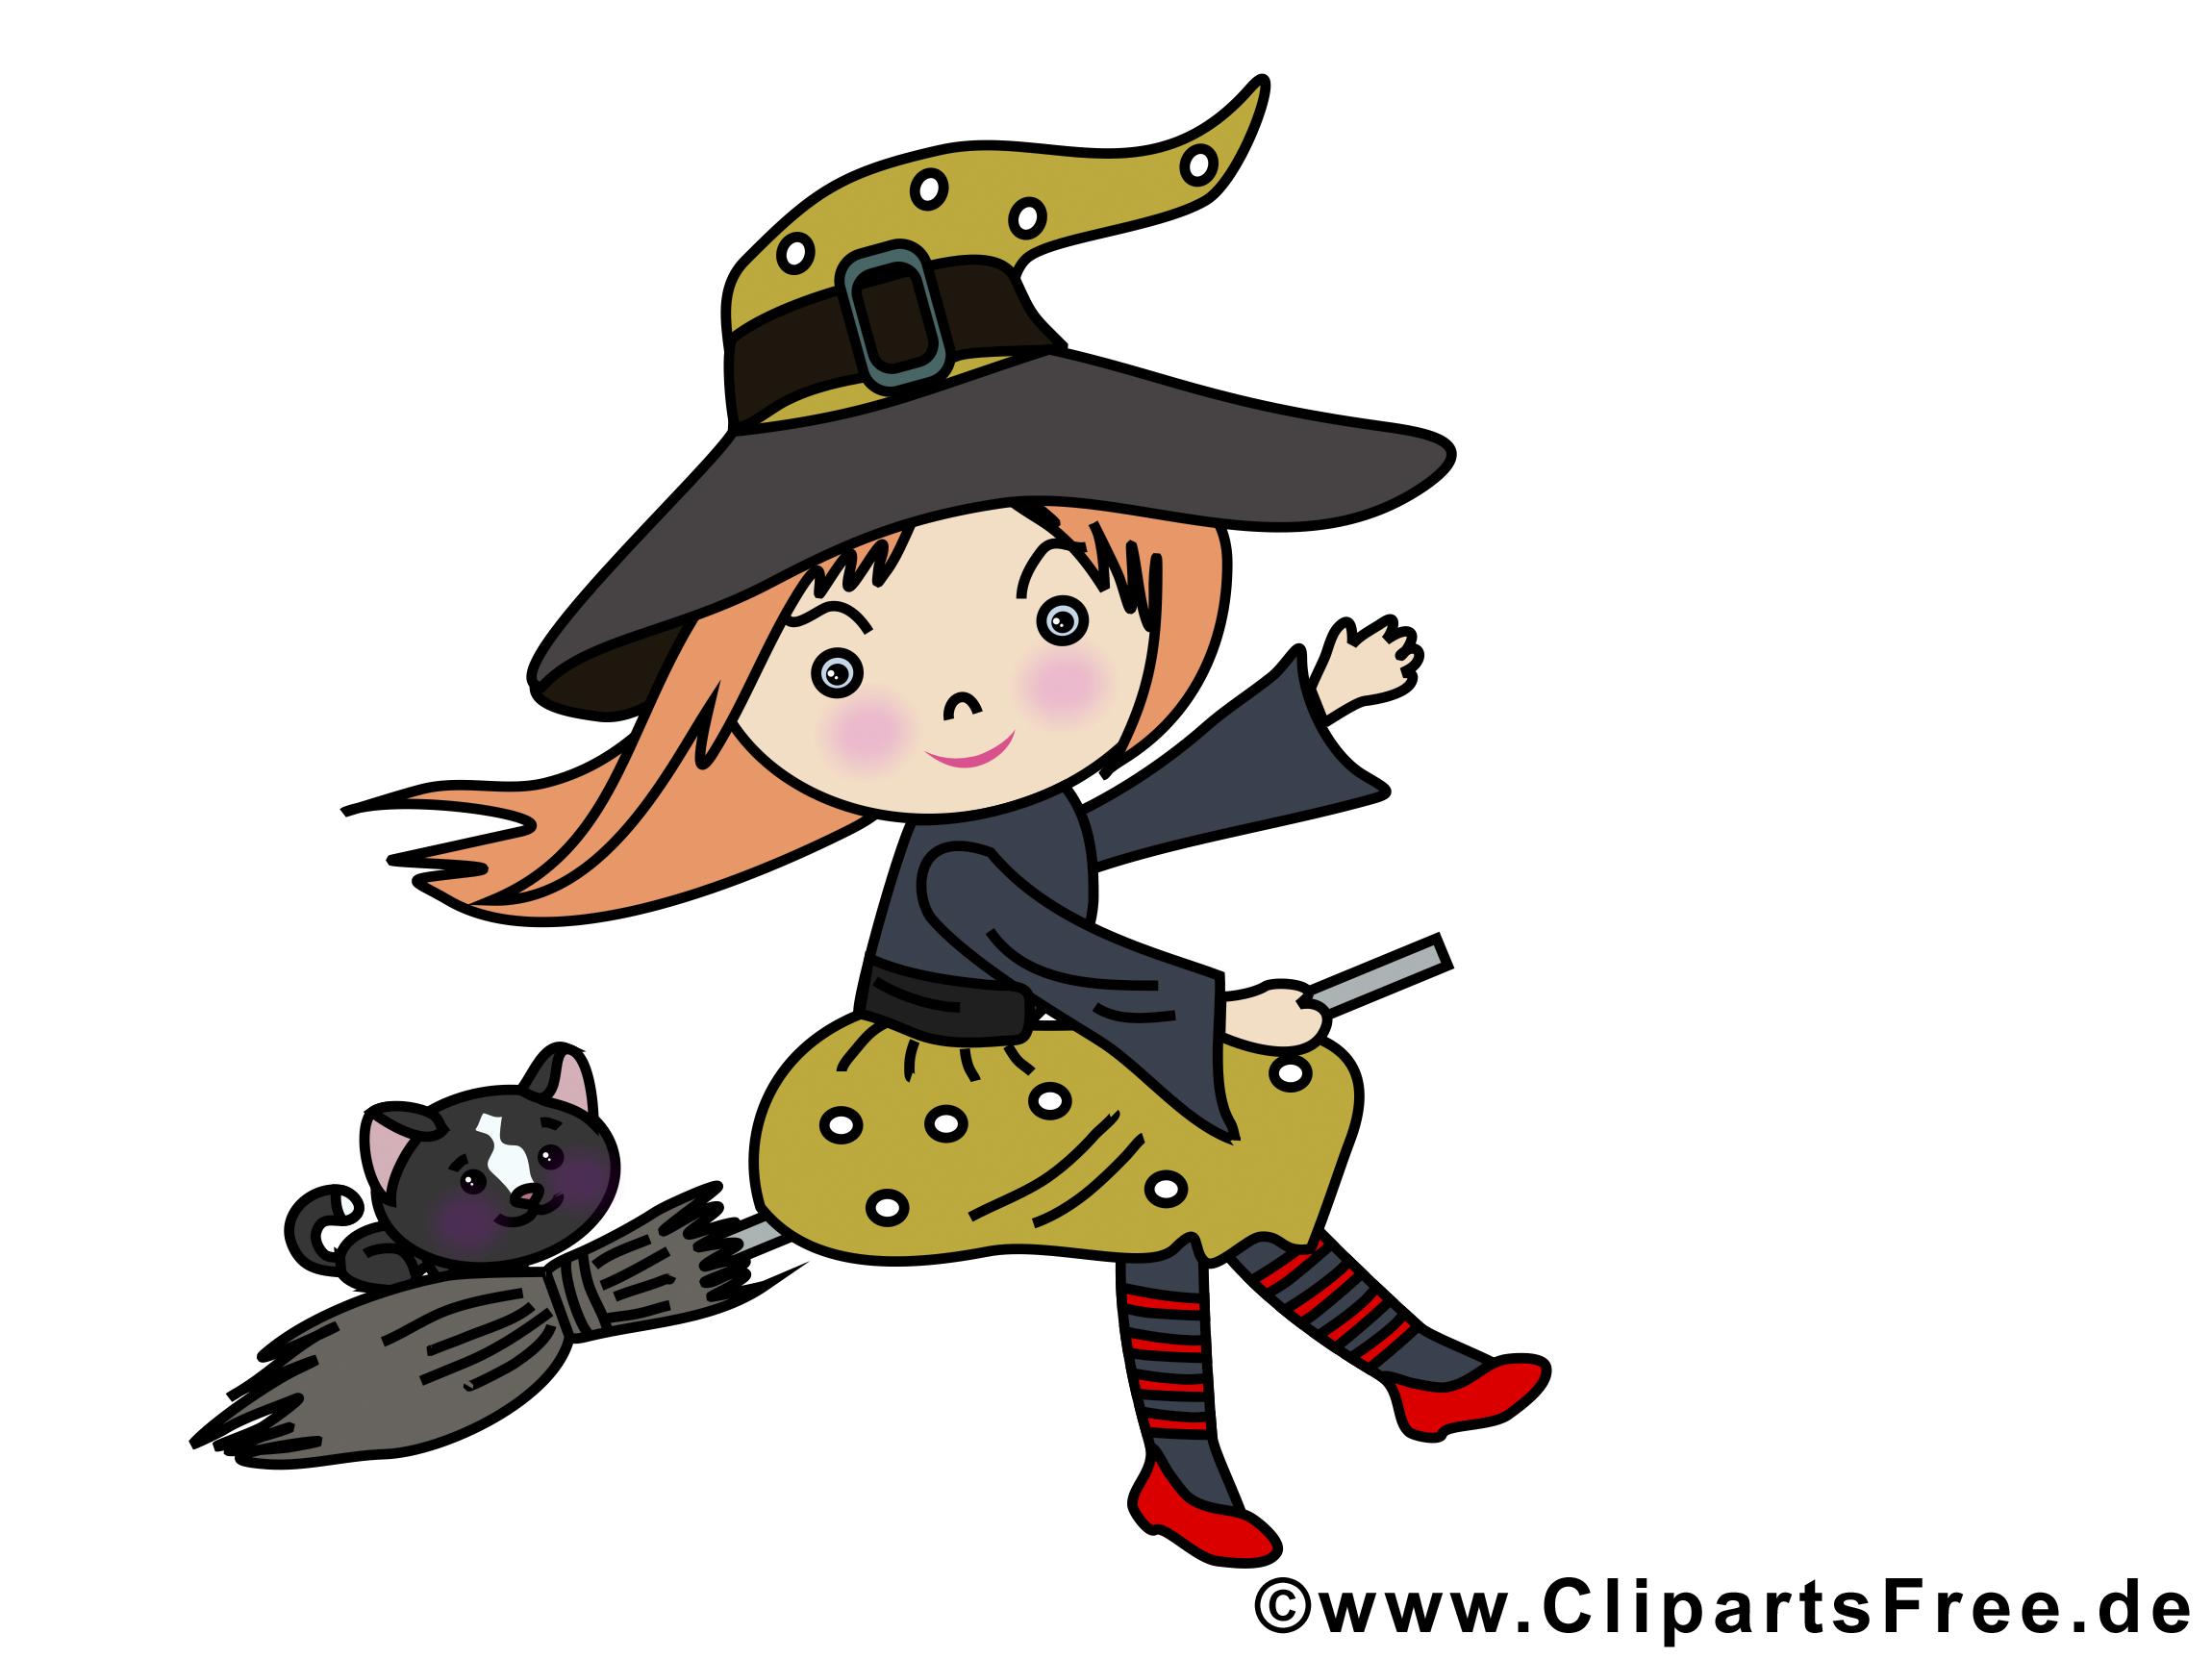 clipart halloween hexen - photo #2